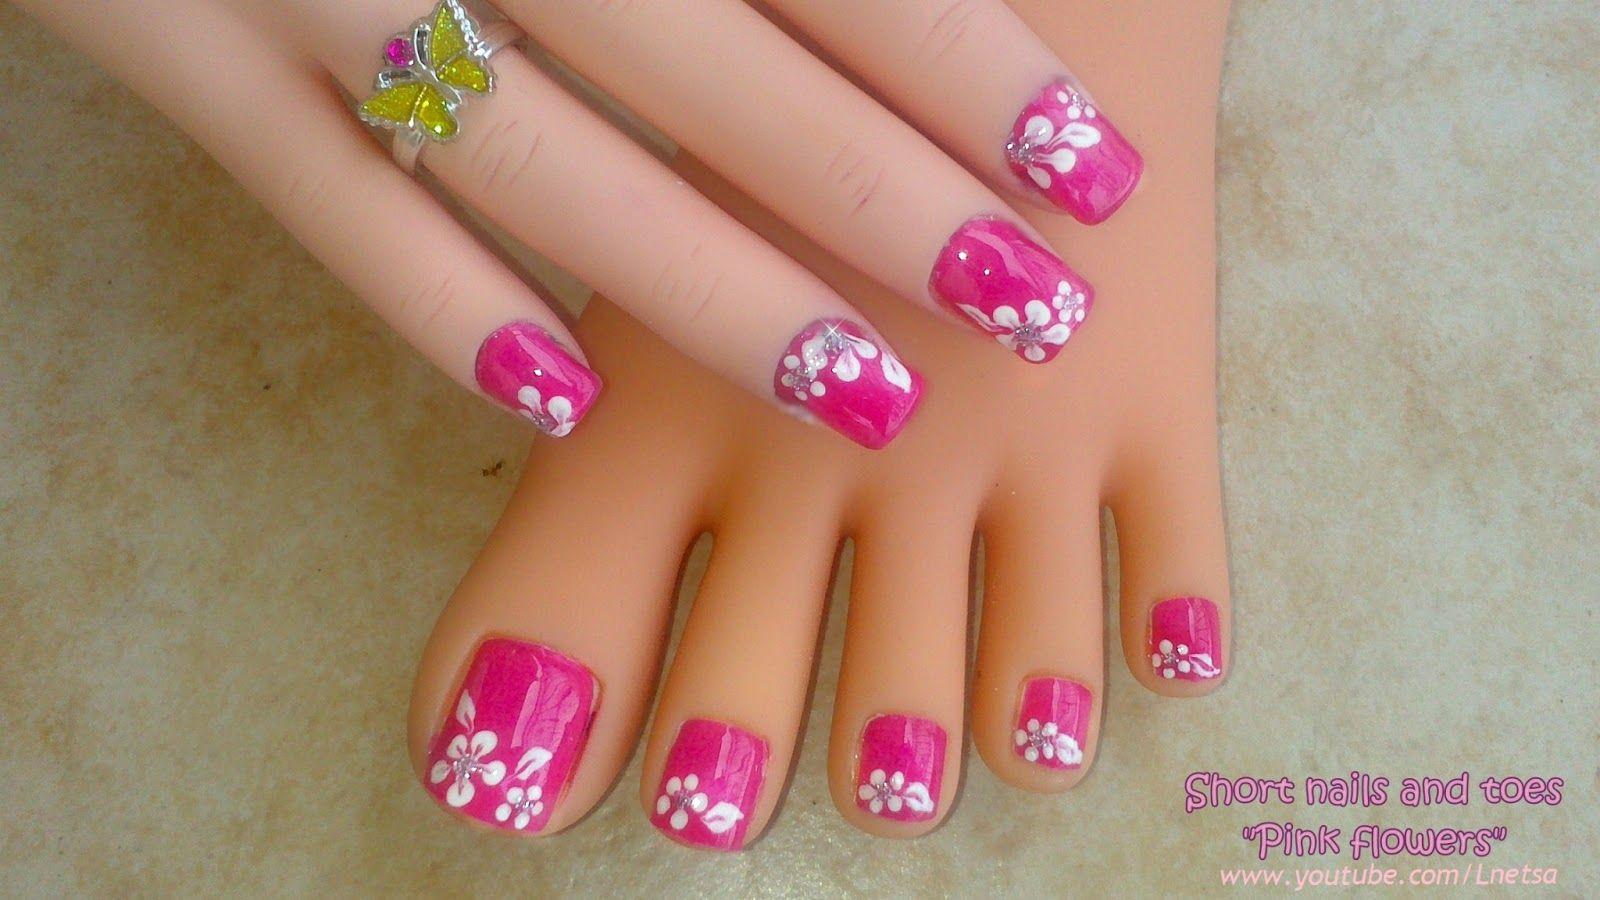 Toe Nail Art Design Ideas Toe Nail Designs Images Pl5 Images Of